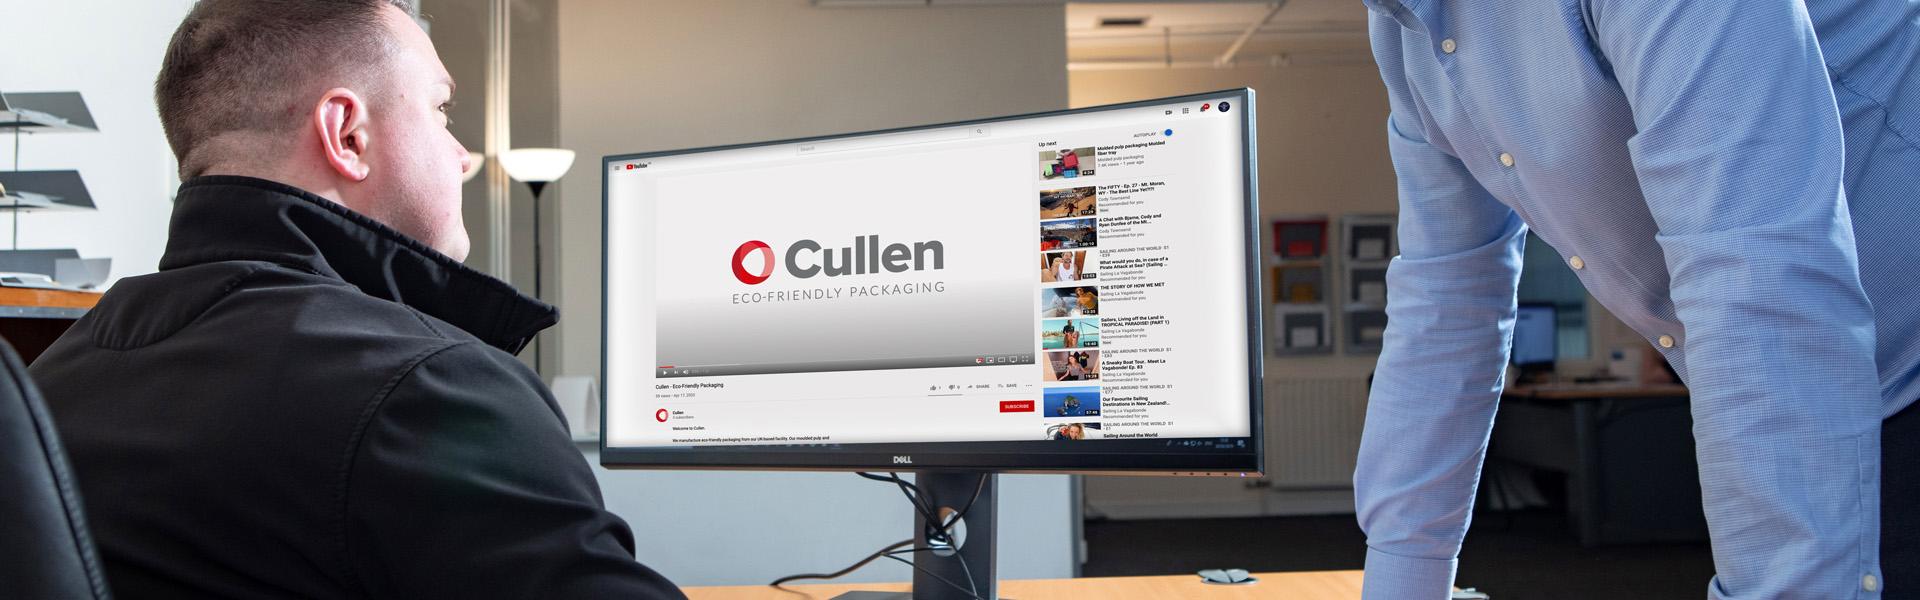 Cullen Media YouTube